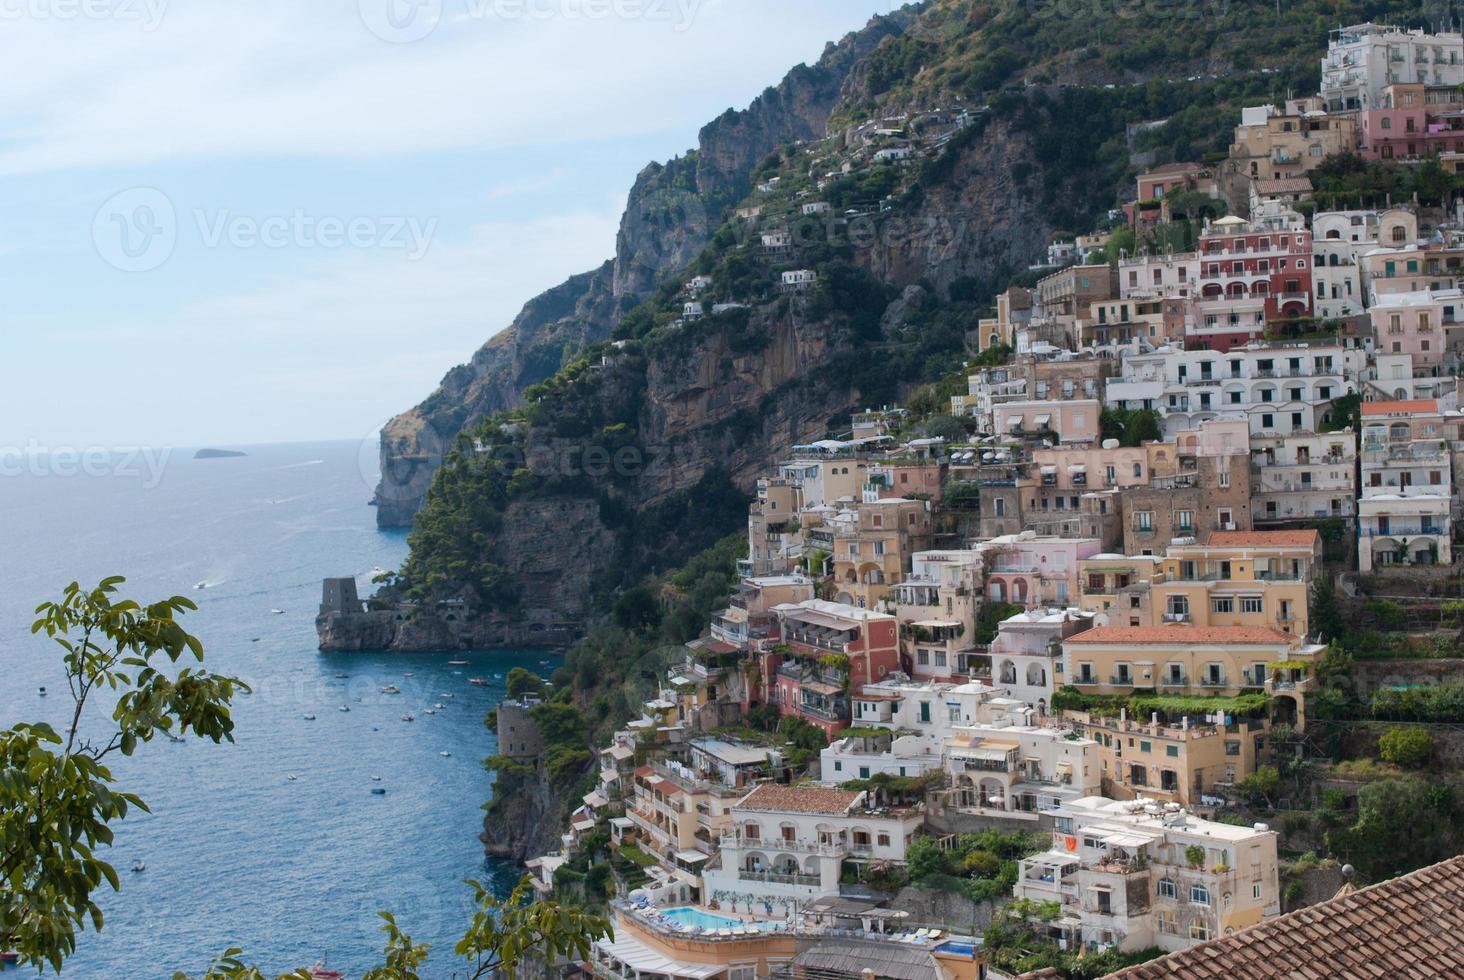 Positano village, from Amalfi Coast, Italy photo